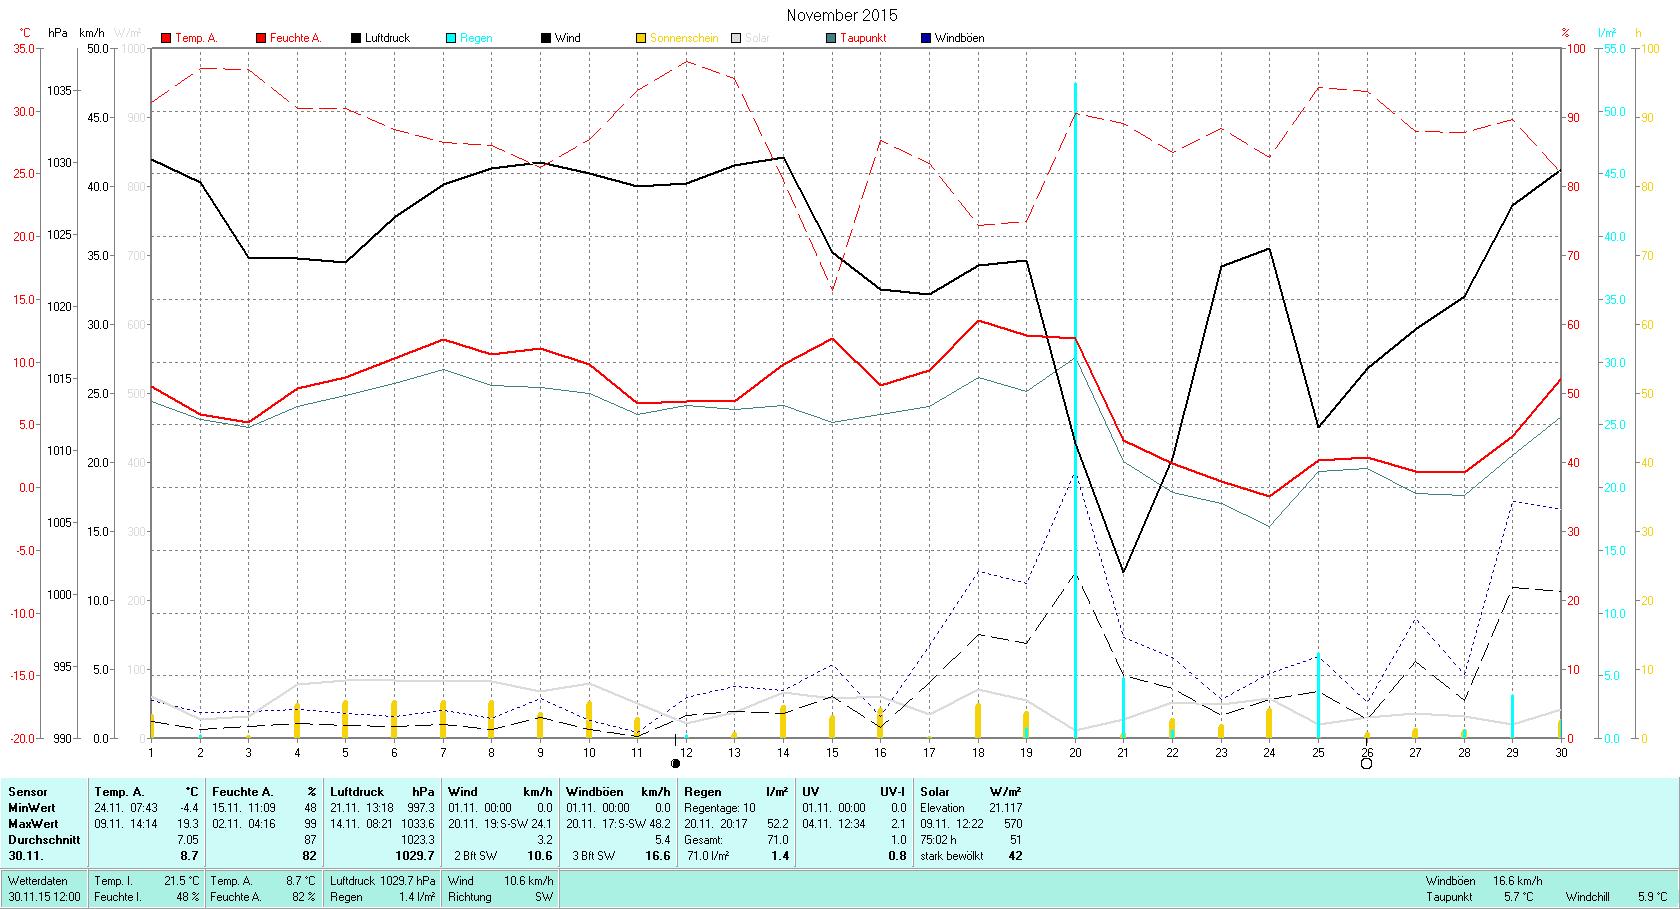 November 2015 Tmin -4.4°C, Tmax 19.3°C, Sonne 75:02h, Niederschlag 71.0mm/2